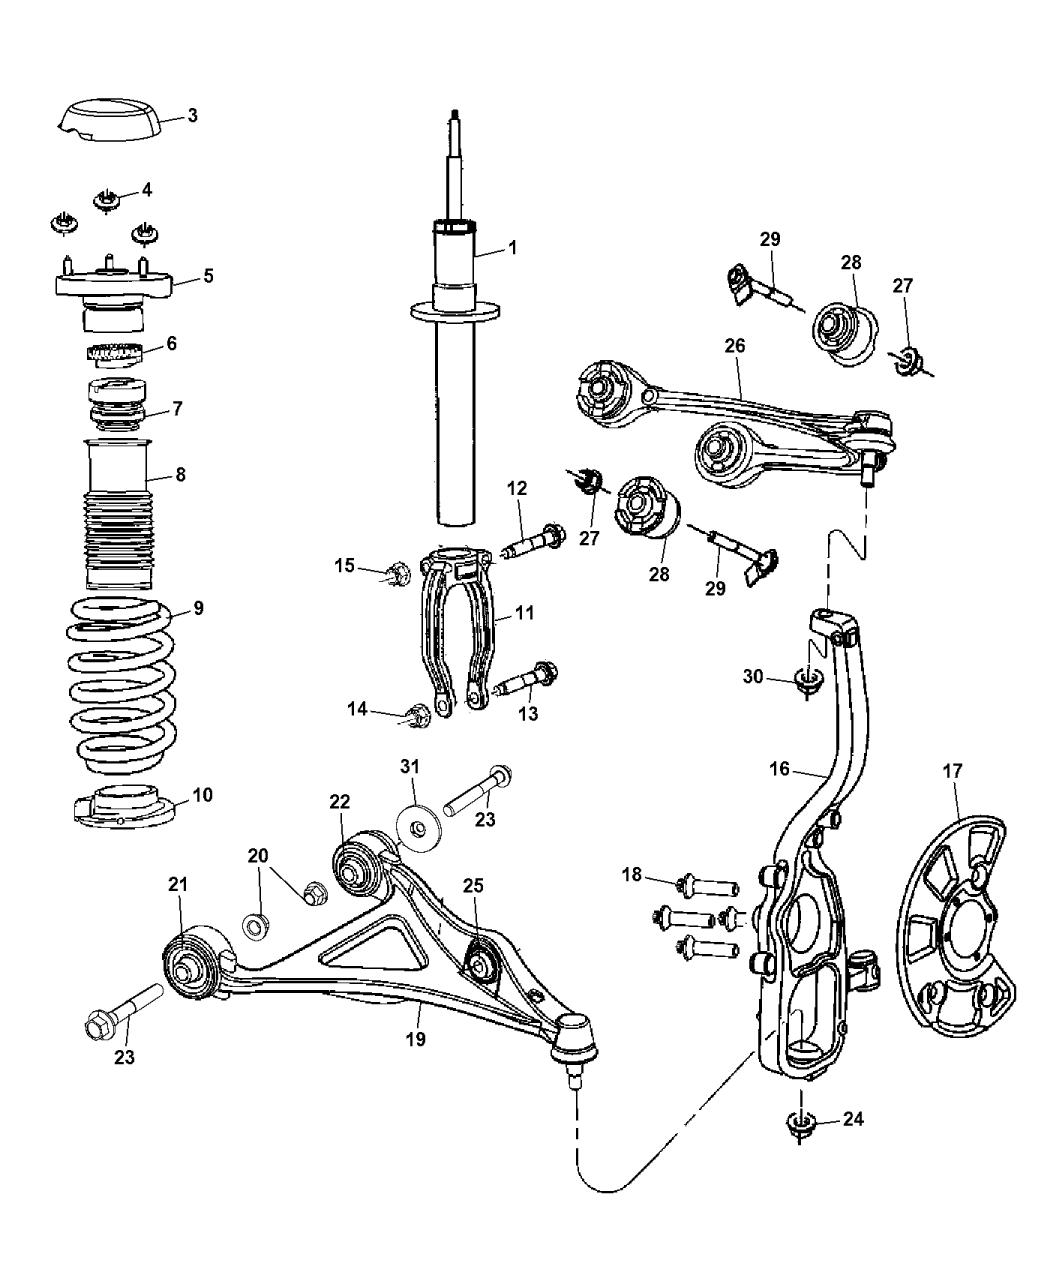 74 Dodge Charger Diagram Com